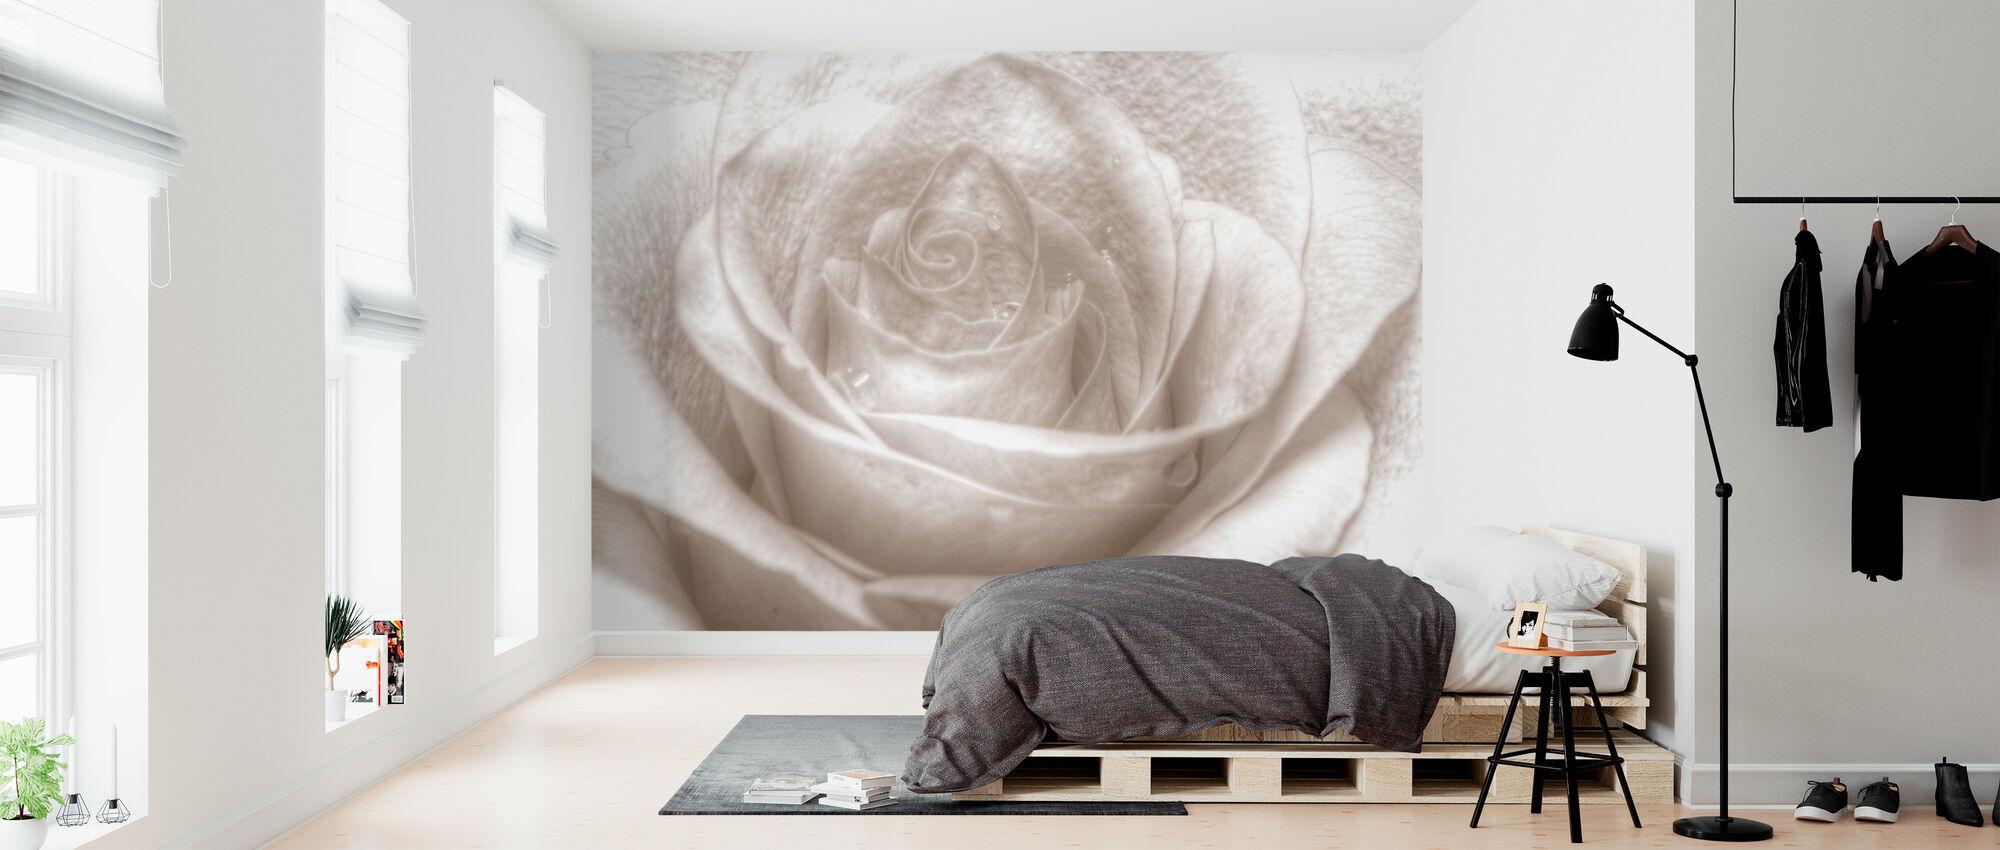 High Key Rose - Wallpaper - Bedroom